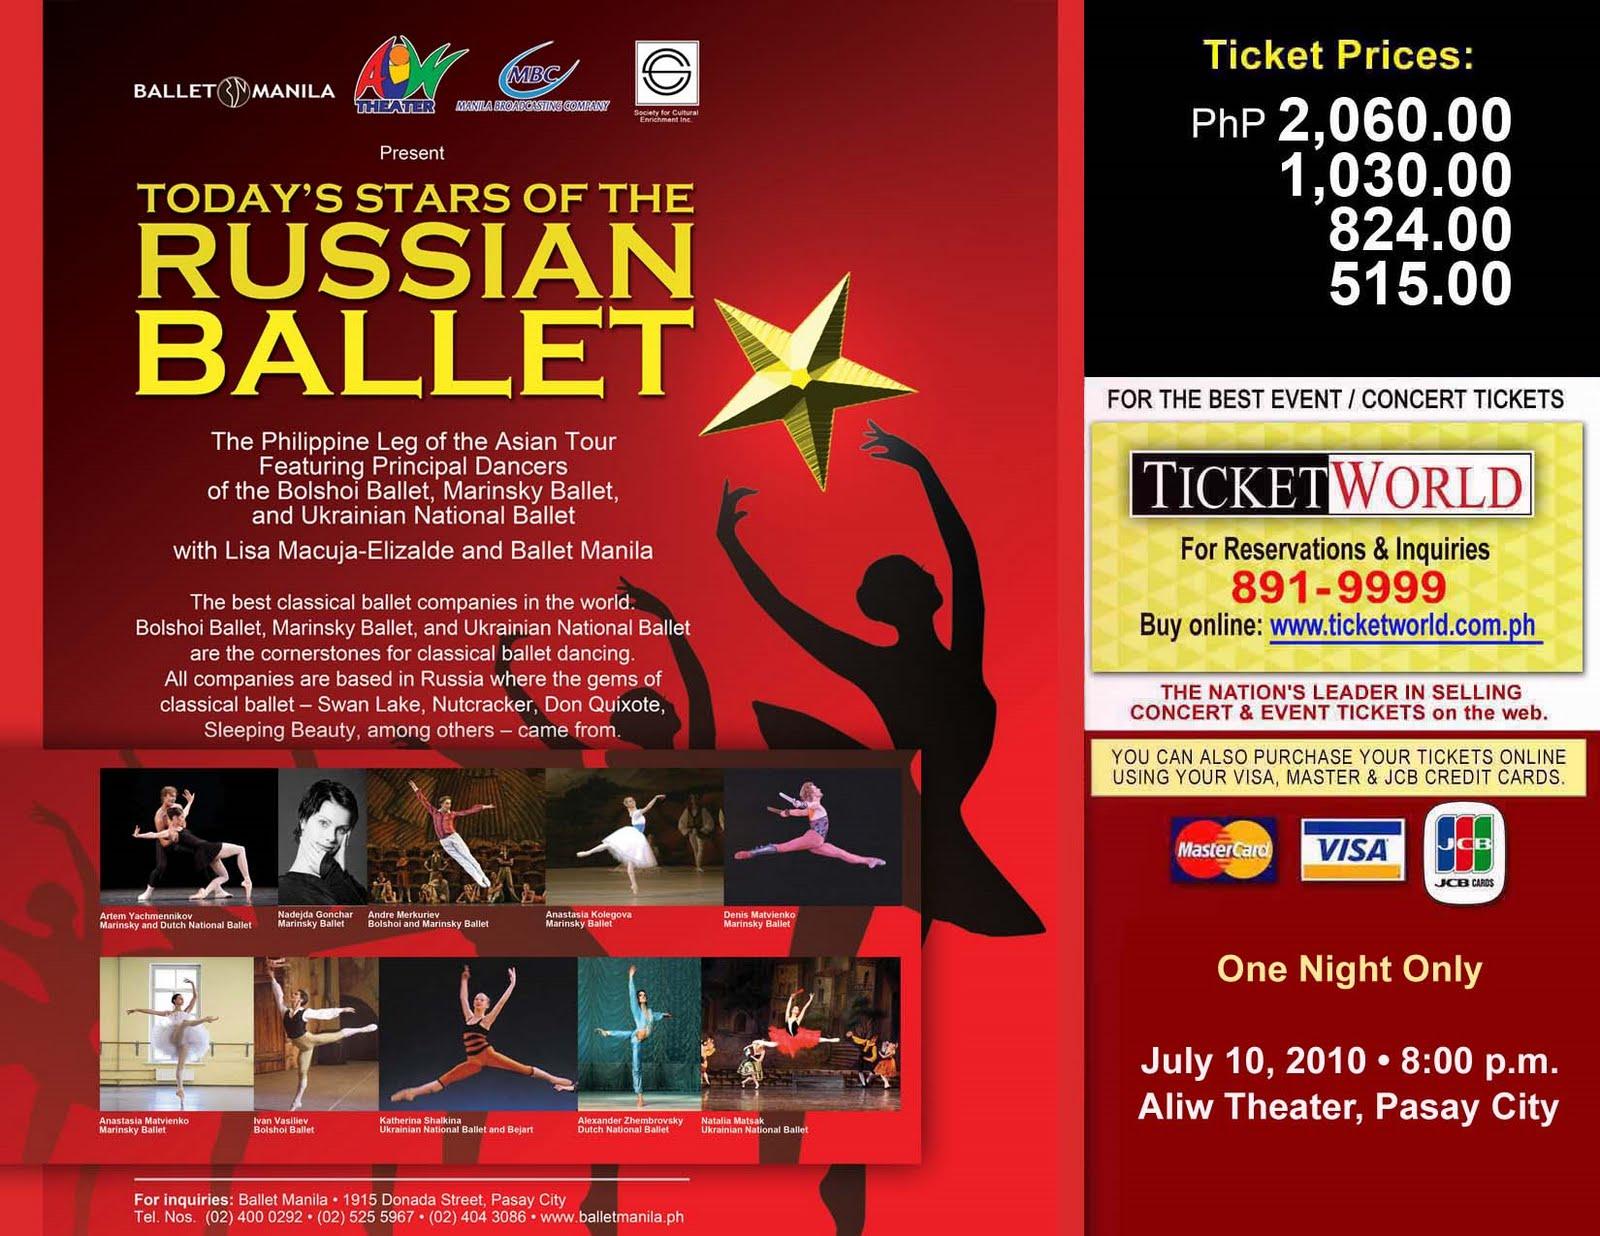 http://2.bp.blogspot.com/_AcBxi0BX5Ig/TDSwqQT6kvI/AAAAAAAAACI/wktNbqj-Rr4/s1600/Russian+Ballet.jpg